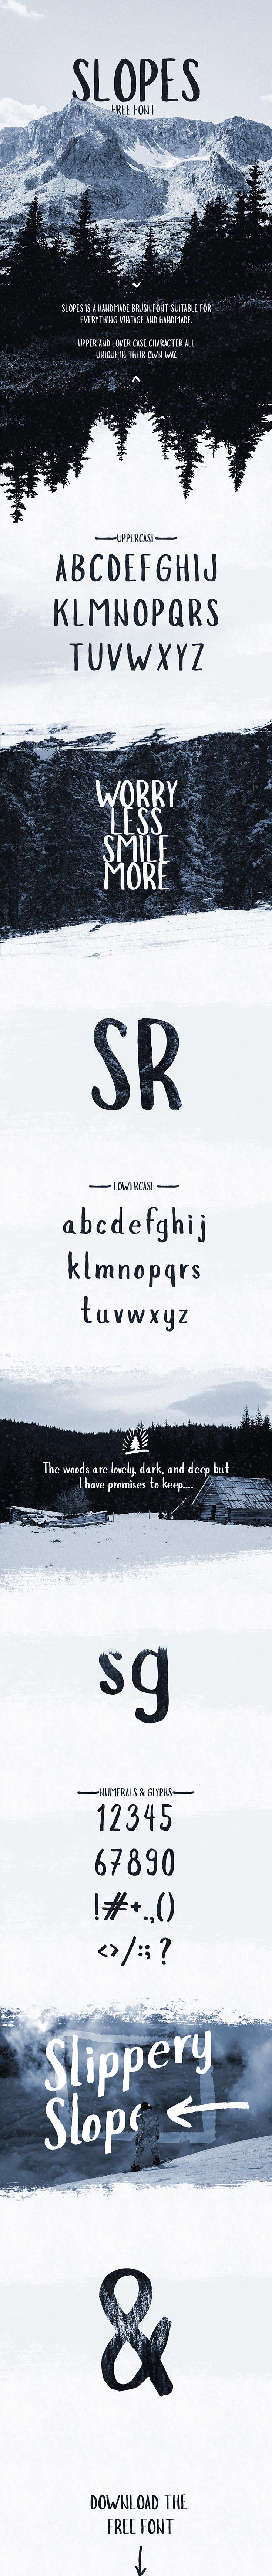 Free Slopes Brush Font